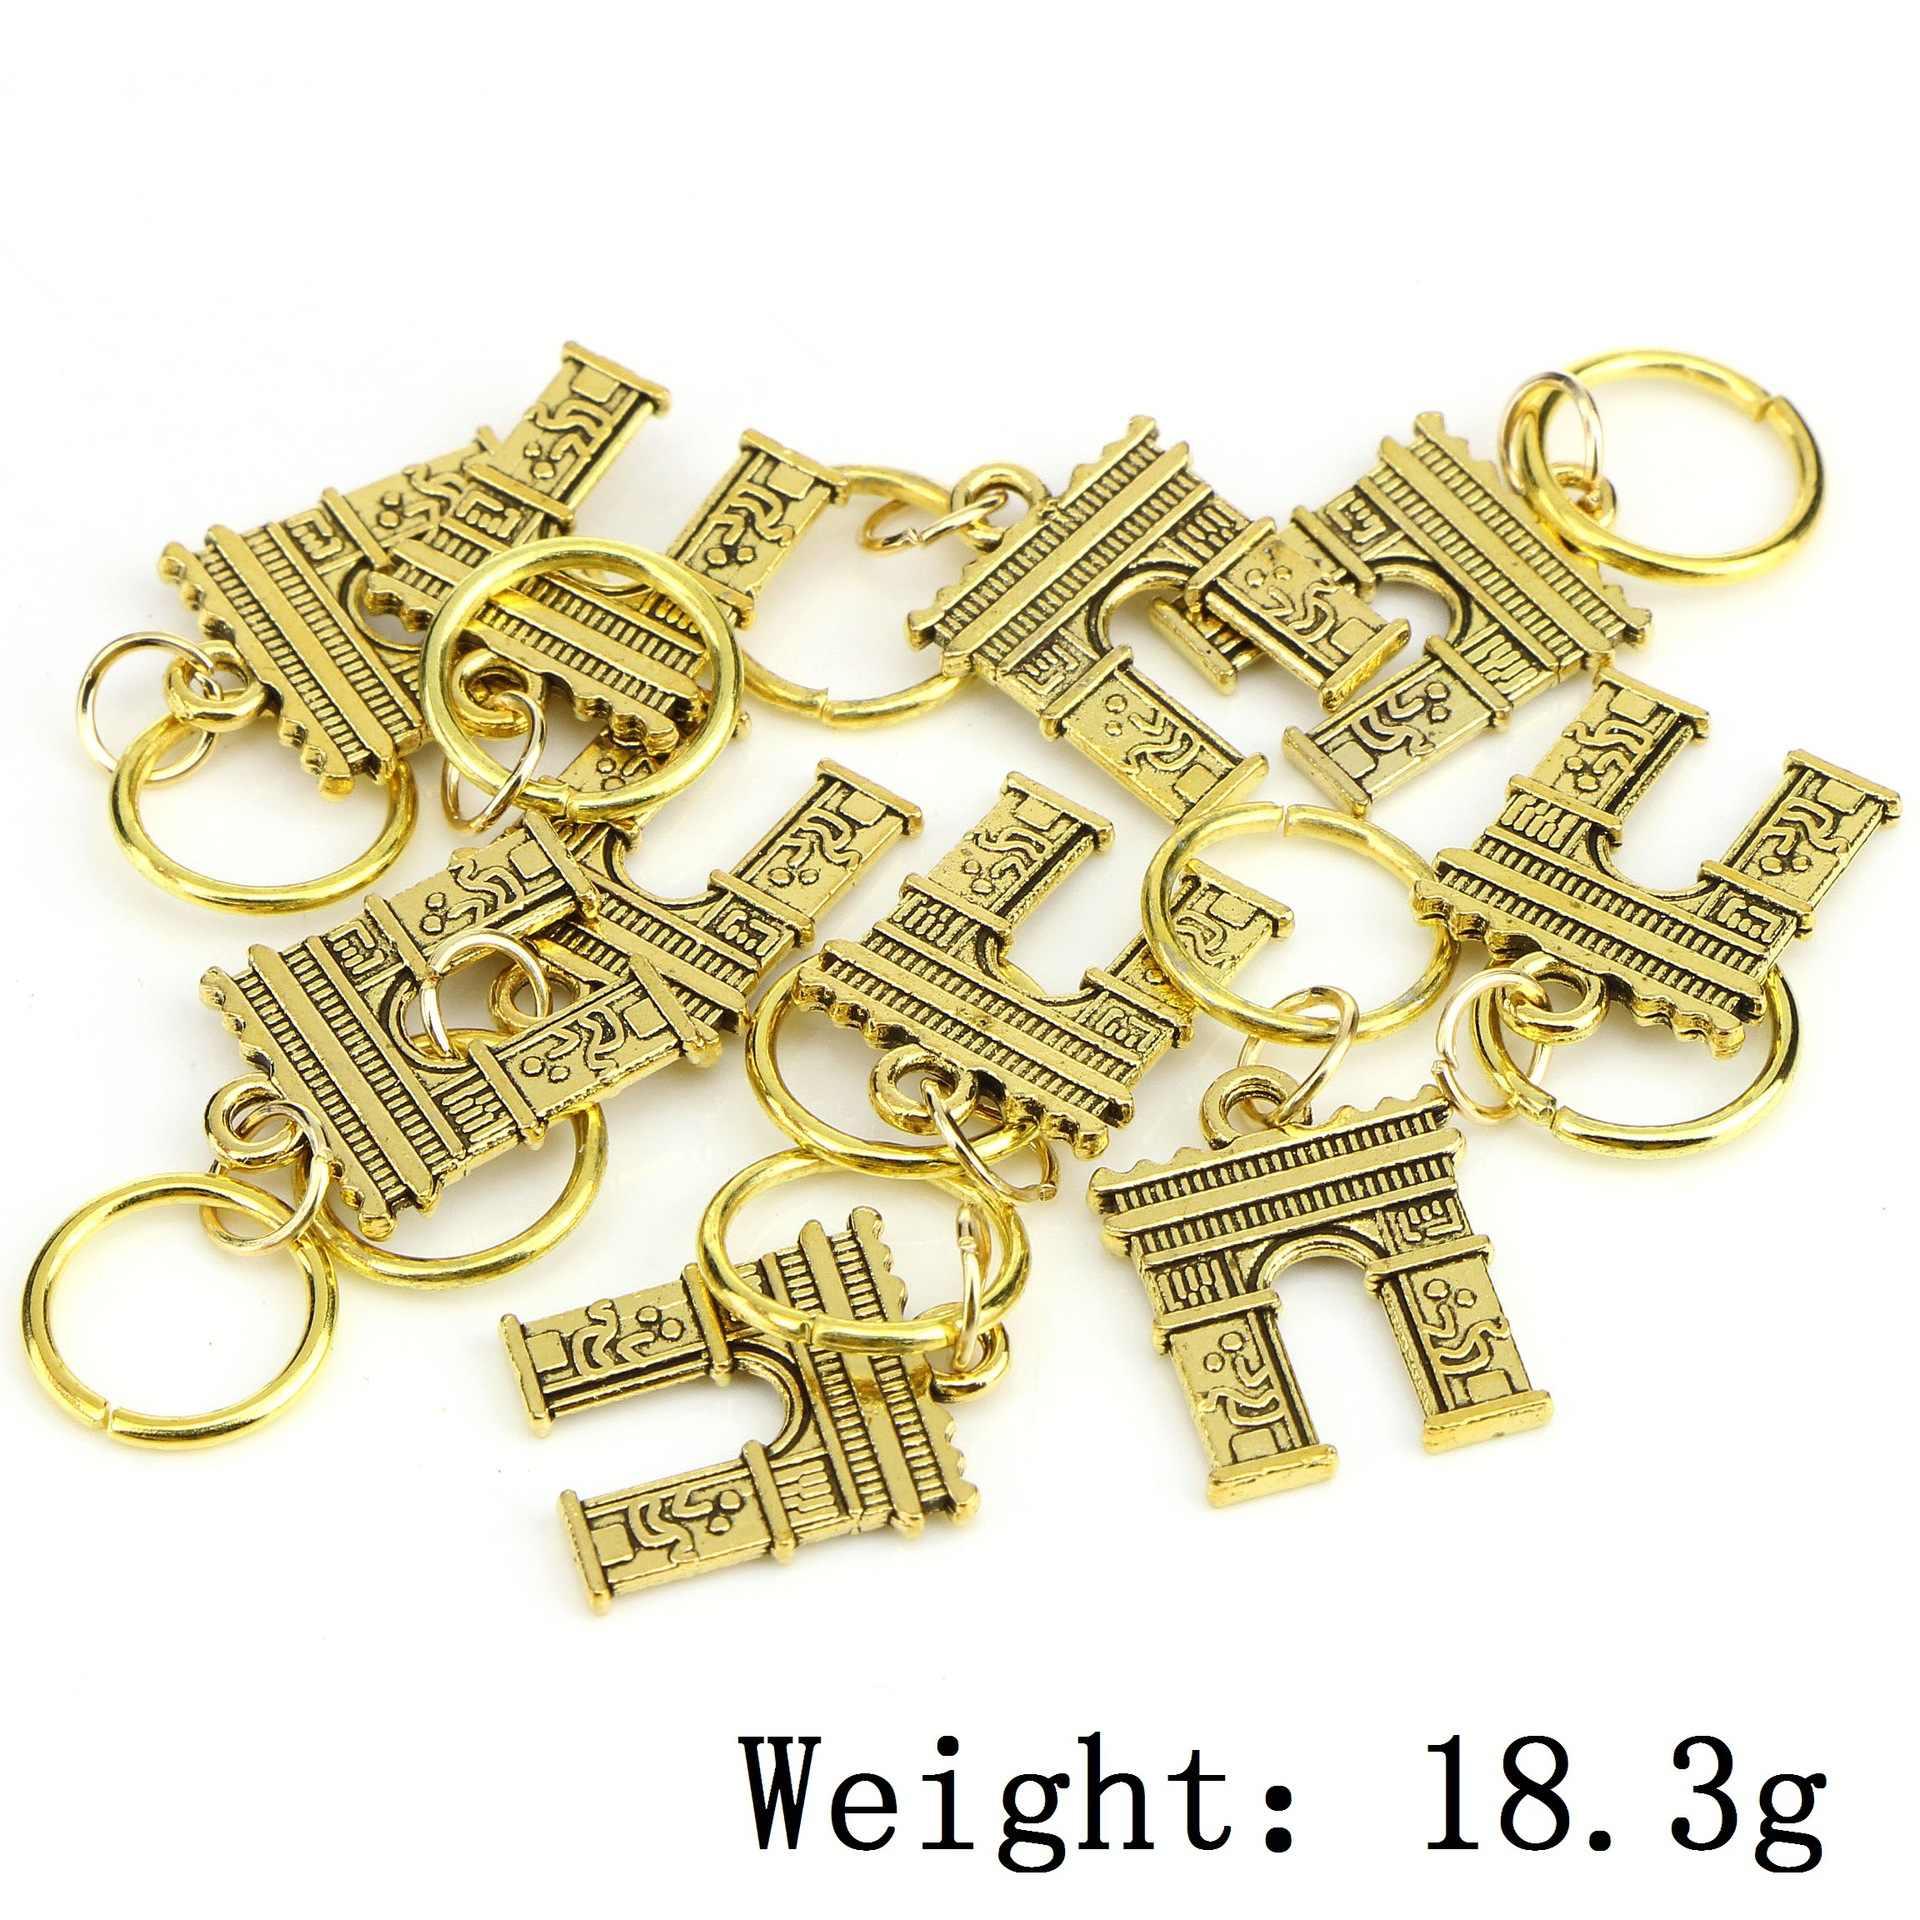 10 stks/pak Goud 14 styles Charms diy haar vlecht dread dreadlock kralen clips manchetten ringen Sieraden dreadlock haar accessoires